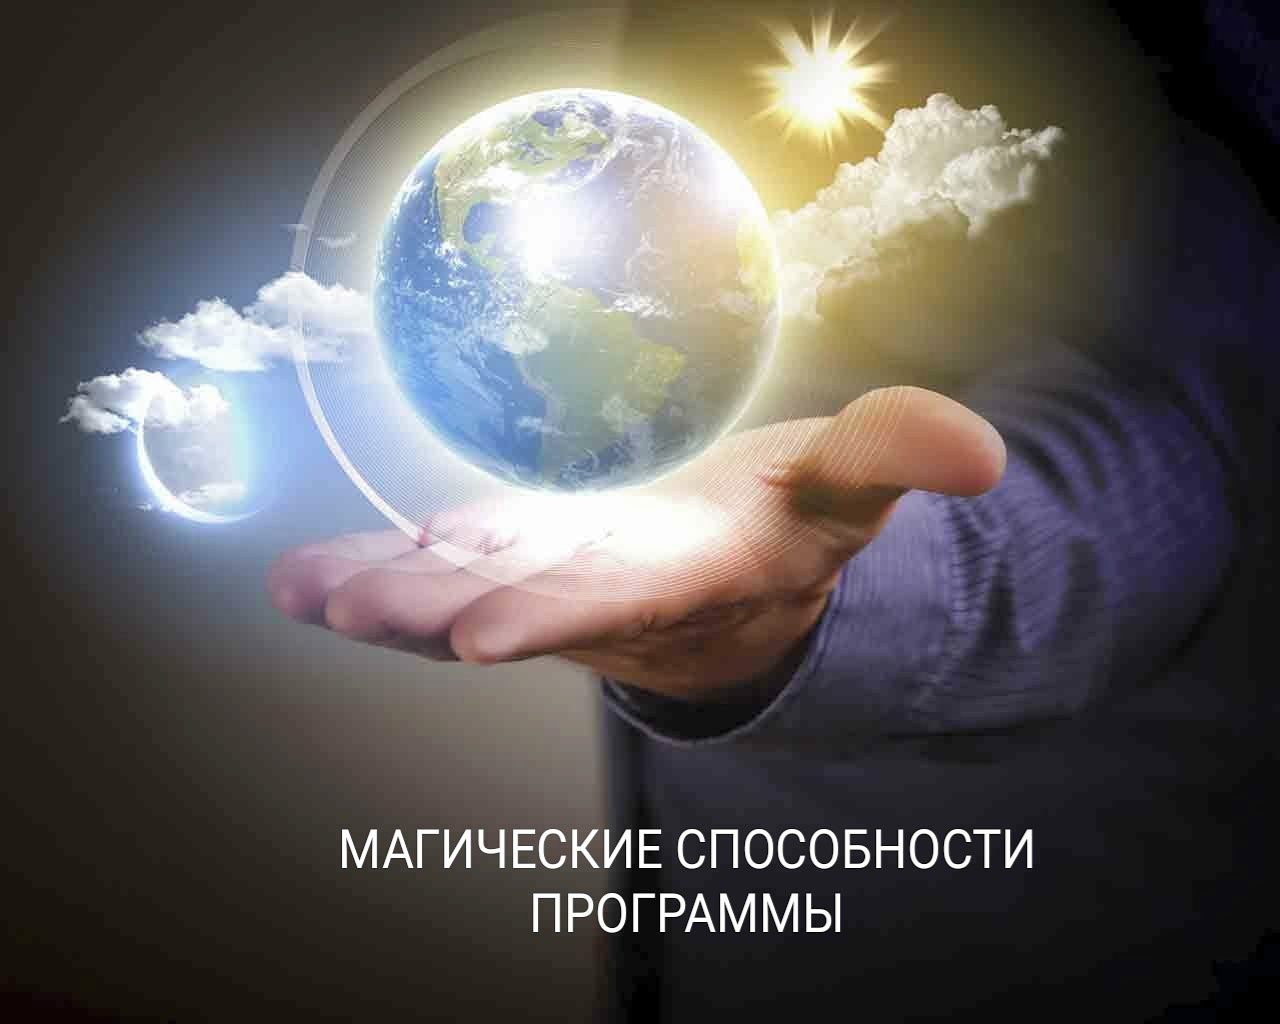 силаума - Программы от Елены Руденко - Страница 2 9F6AmFUdK-o